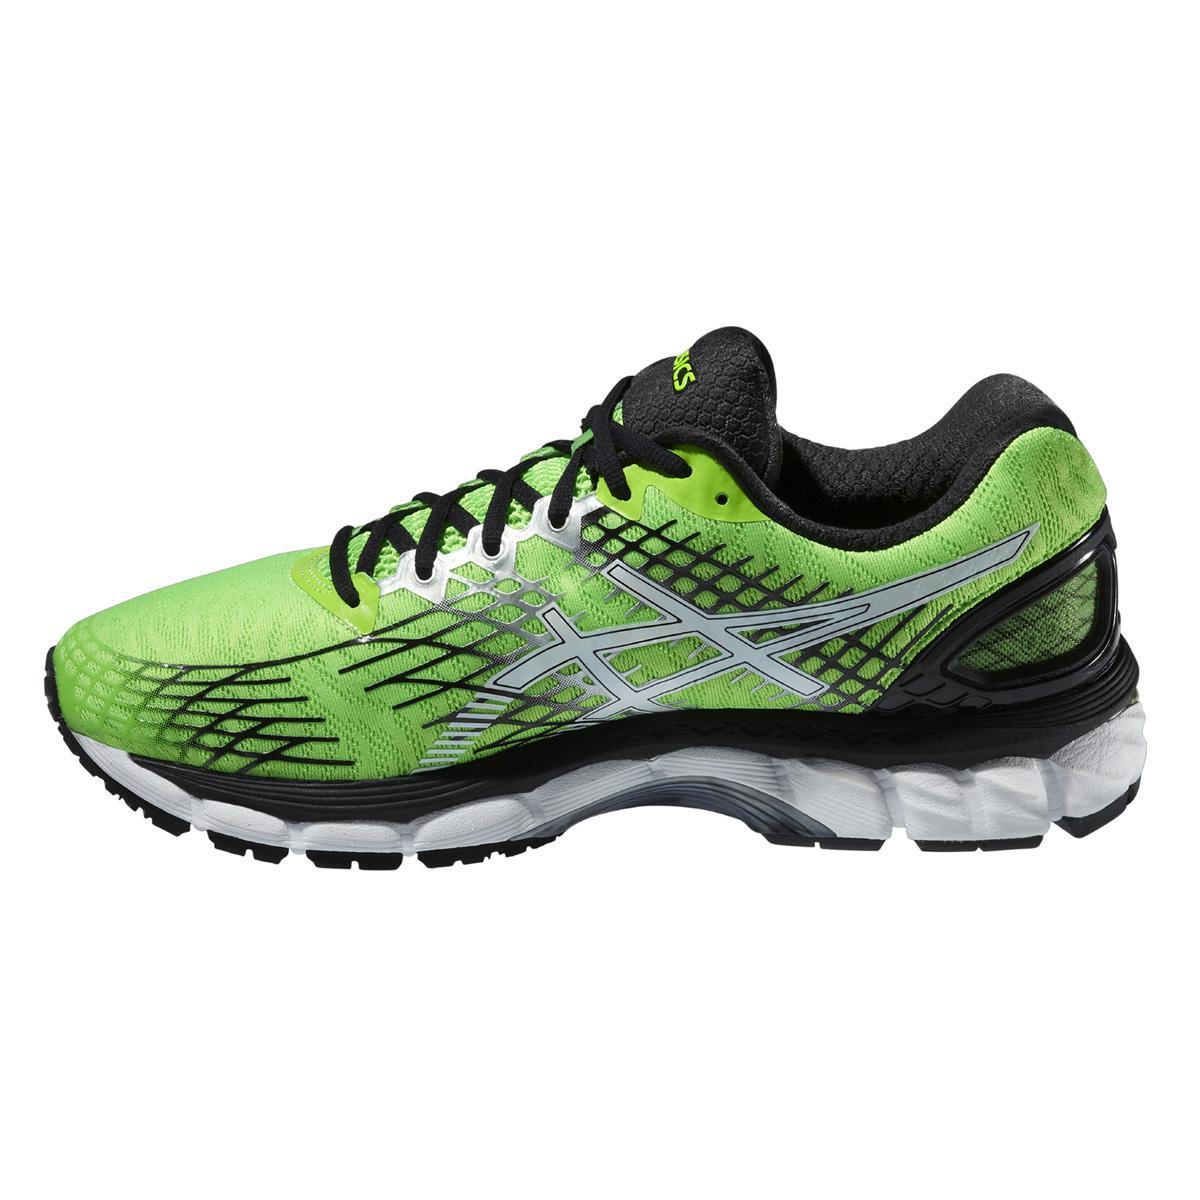 asics mens gel nimbus 17 4e running shoes flash green. Black Bedroom Furniture Sets. Home Design Ideas